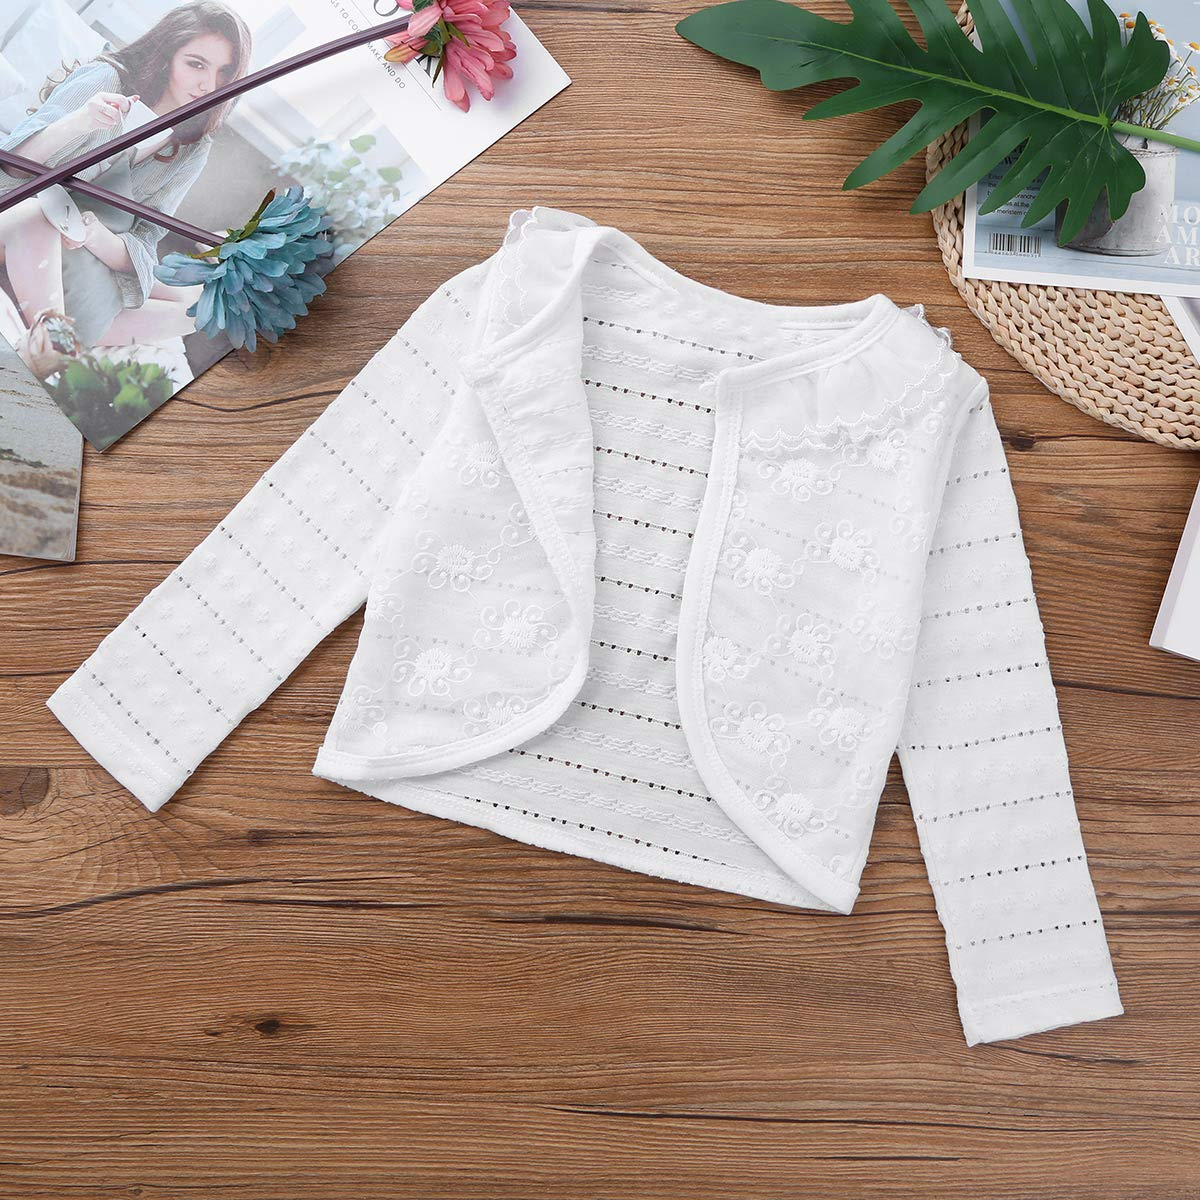 Alvivi Kid Baby Girls Long Sleeves Lace Bolero Shrug Cardigan Flower Dress Cropped Sweater Cover Up Jacket